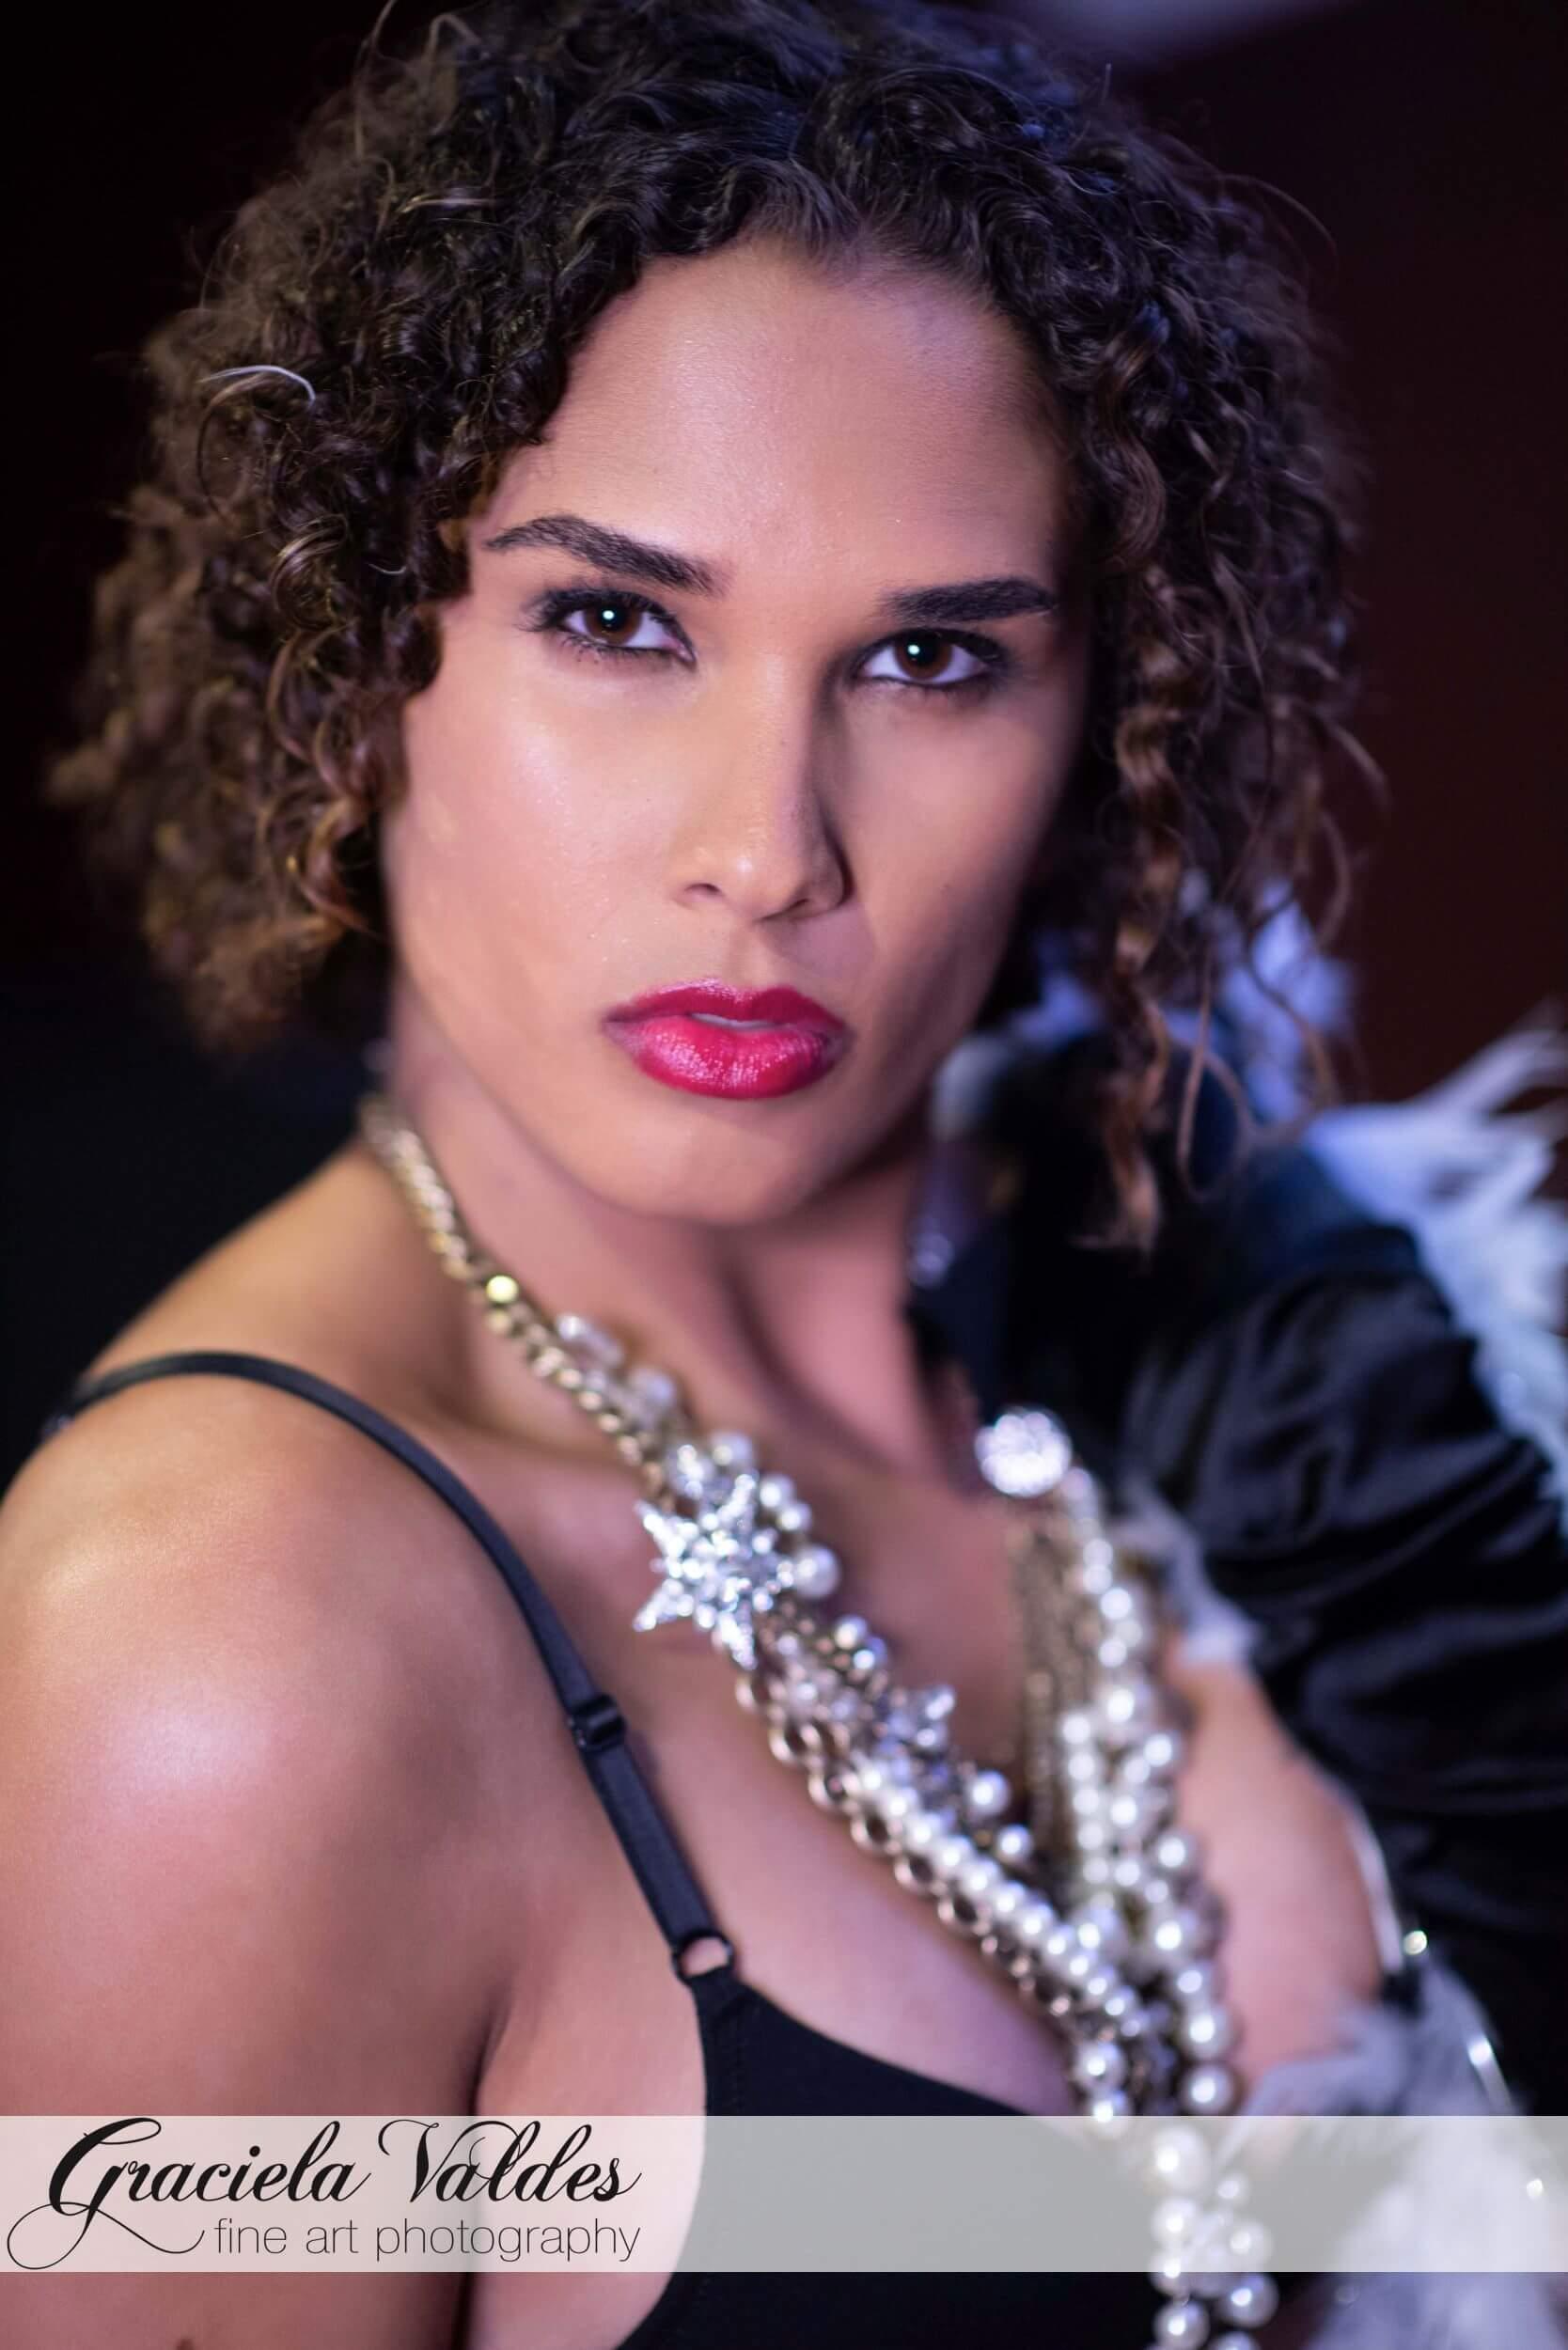 Sex After Dark by Graciela Valdes 82.jpg